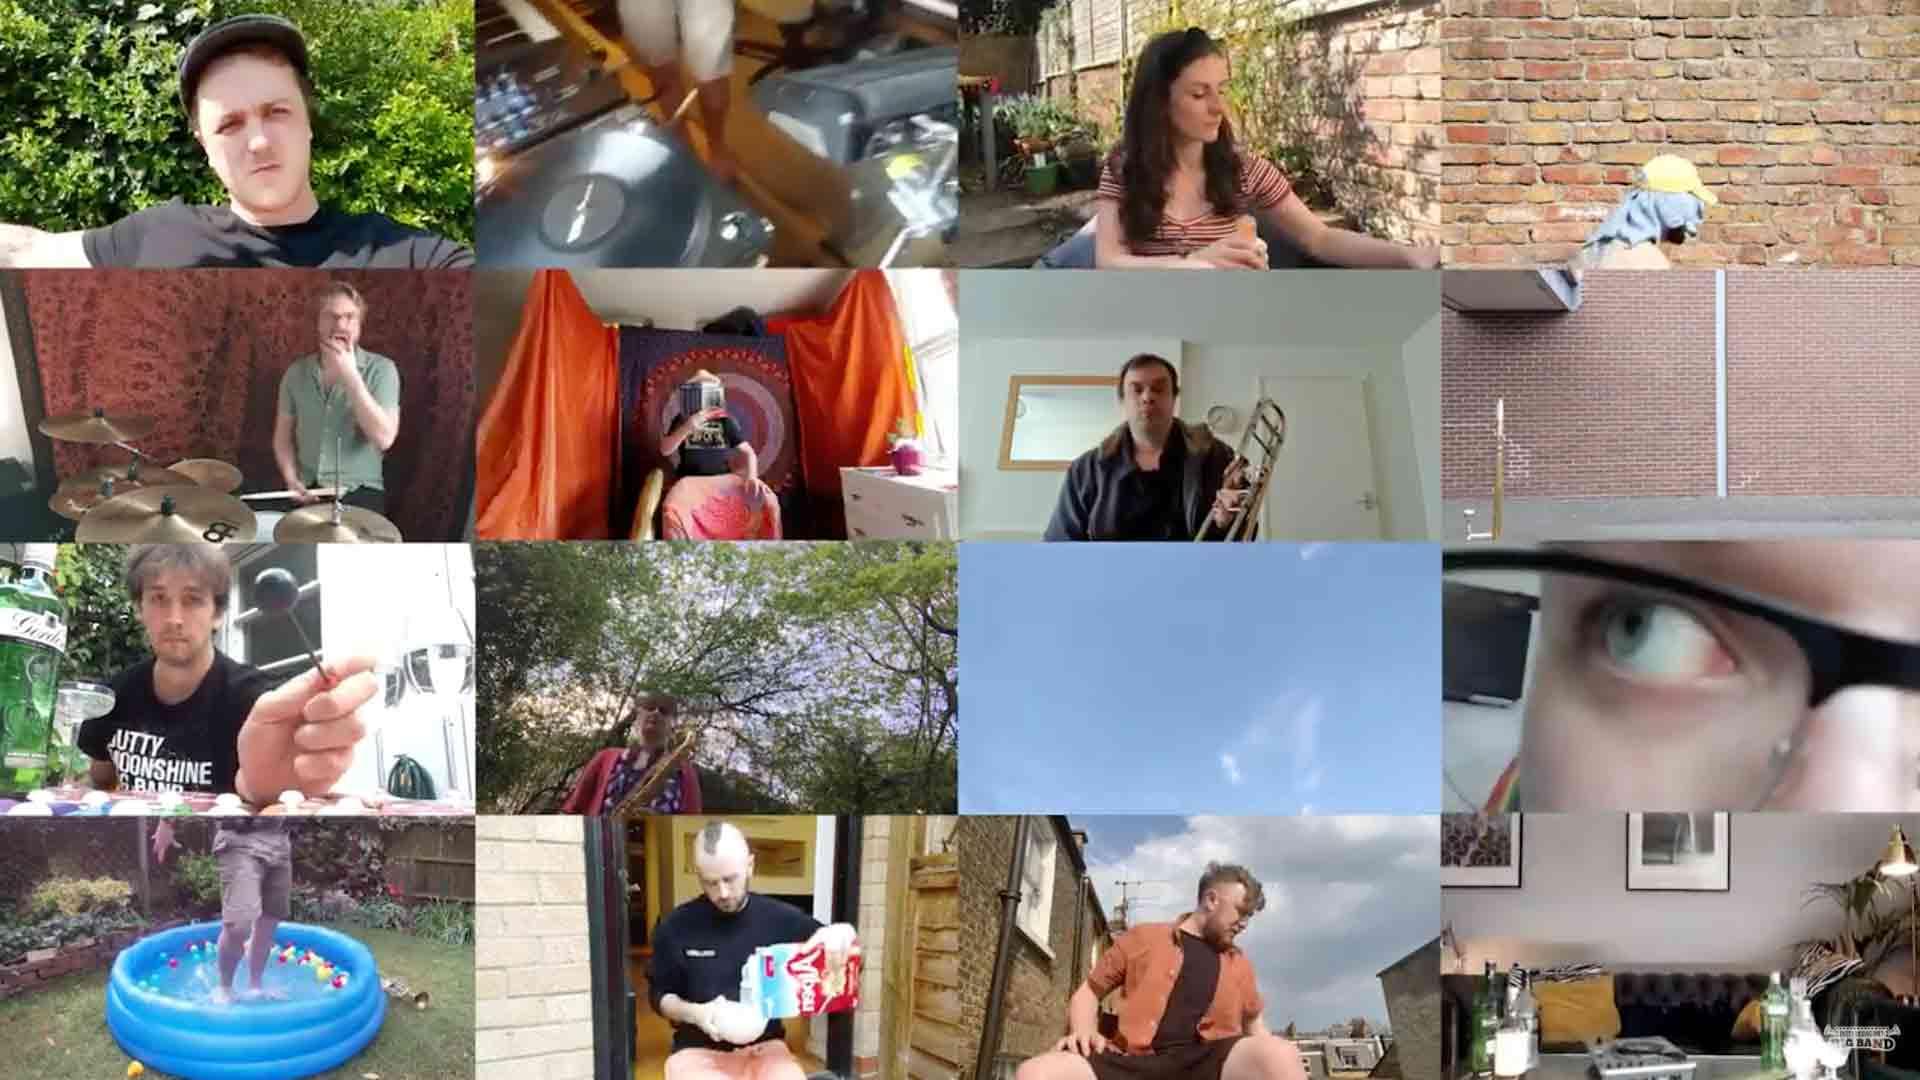 Dutty Moonshine Videos